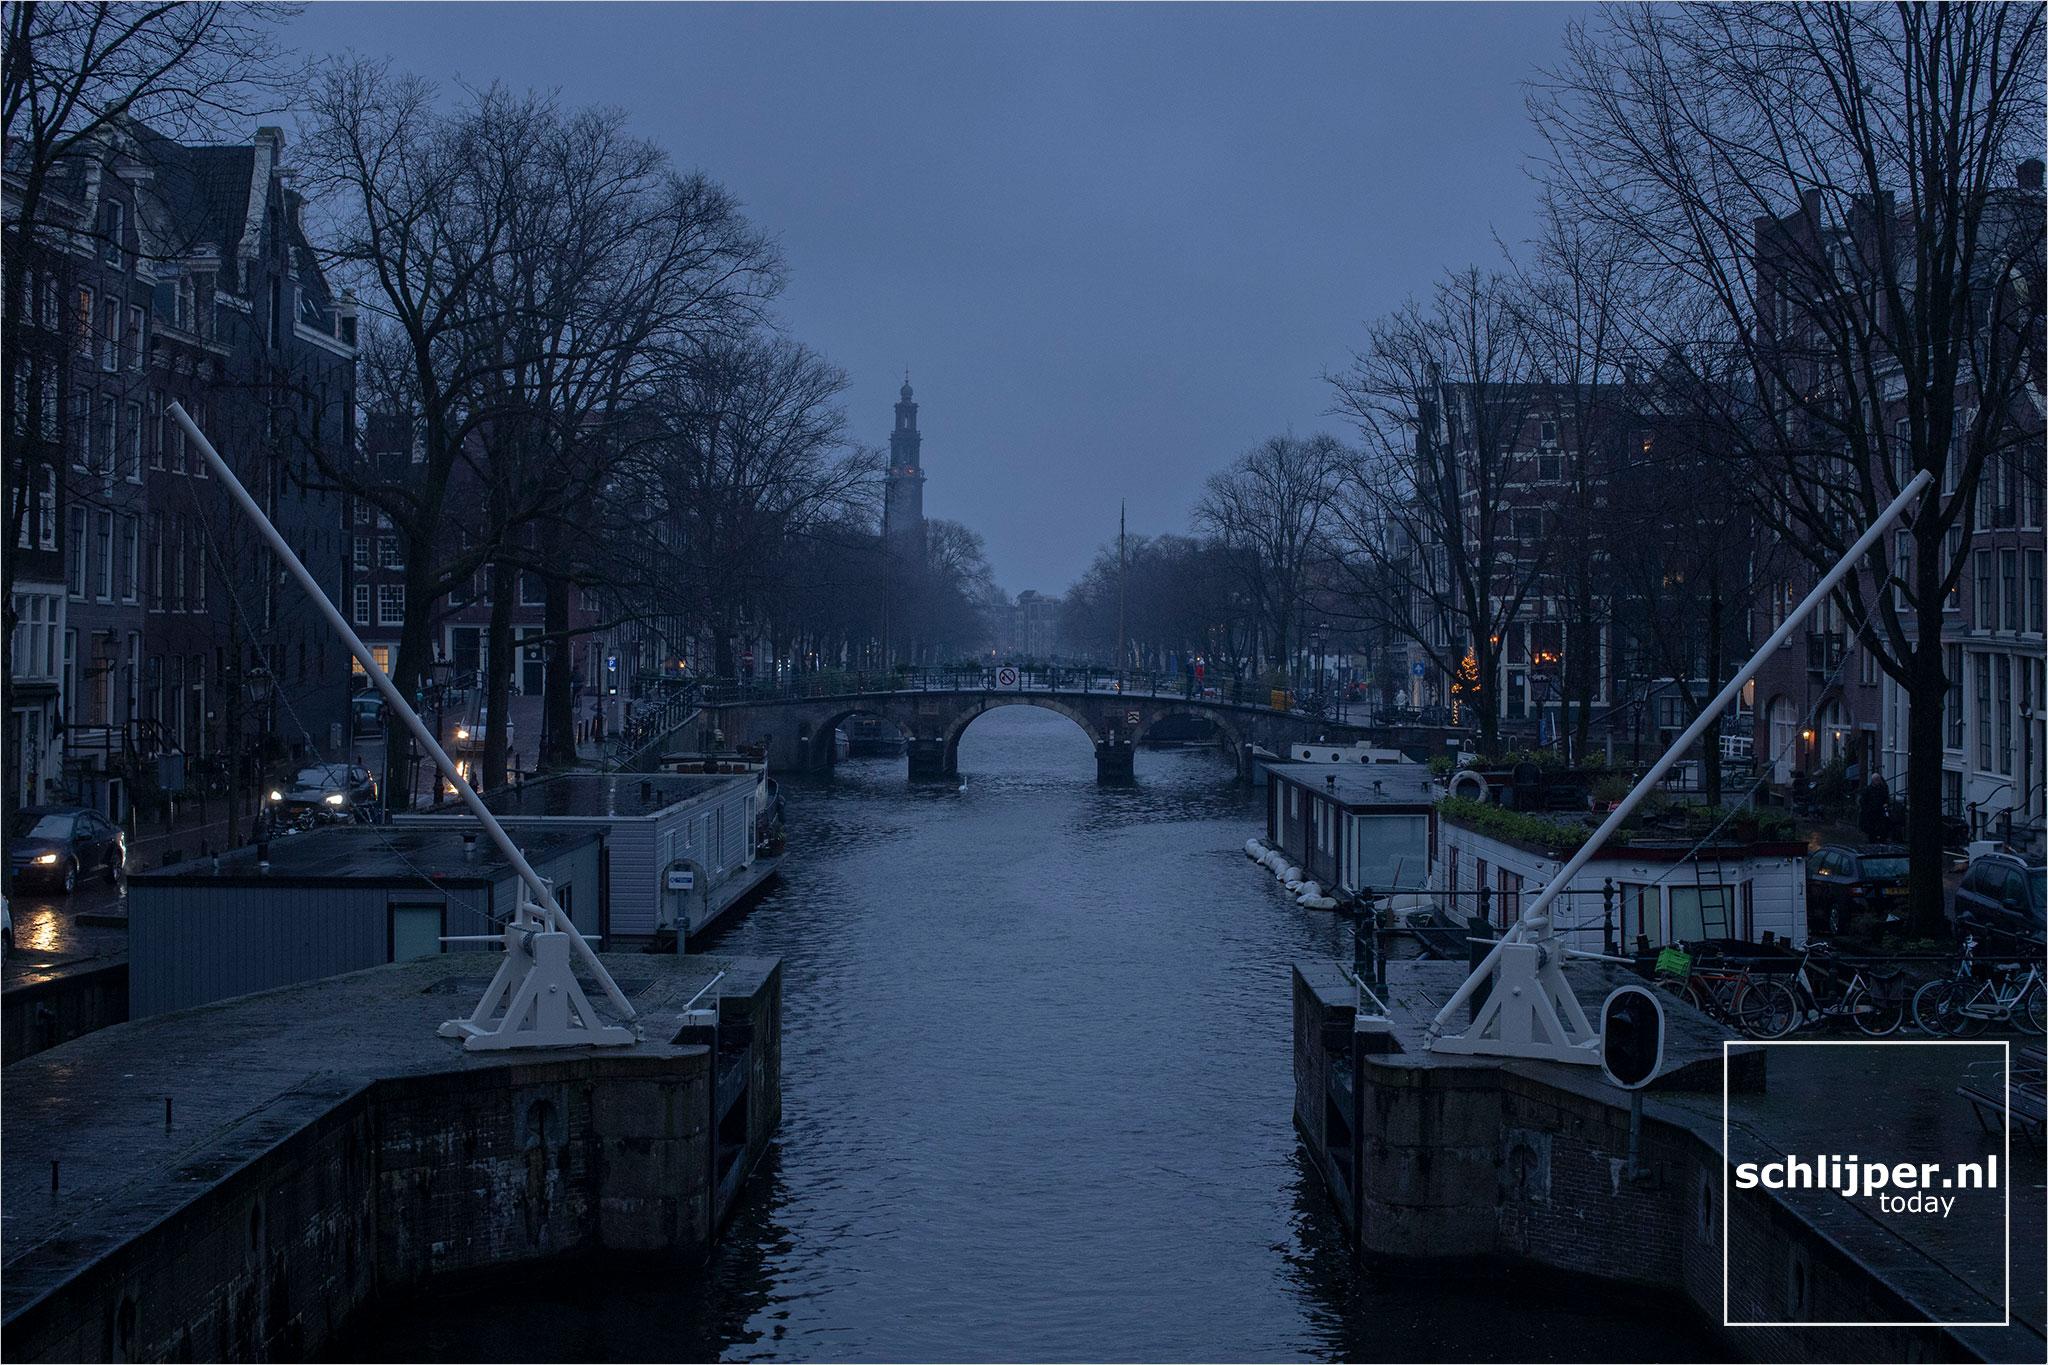 The Netherlands, Amsterdam, 26 december 2020